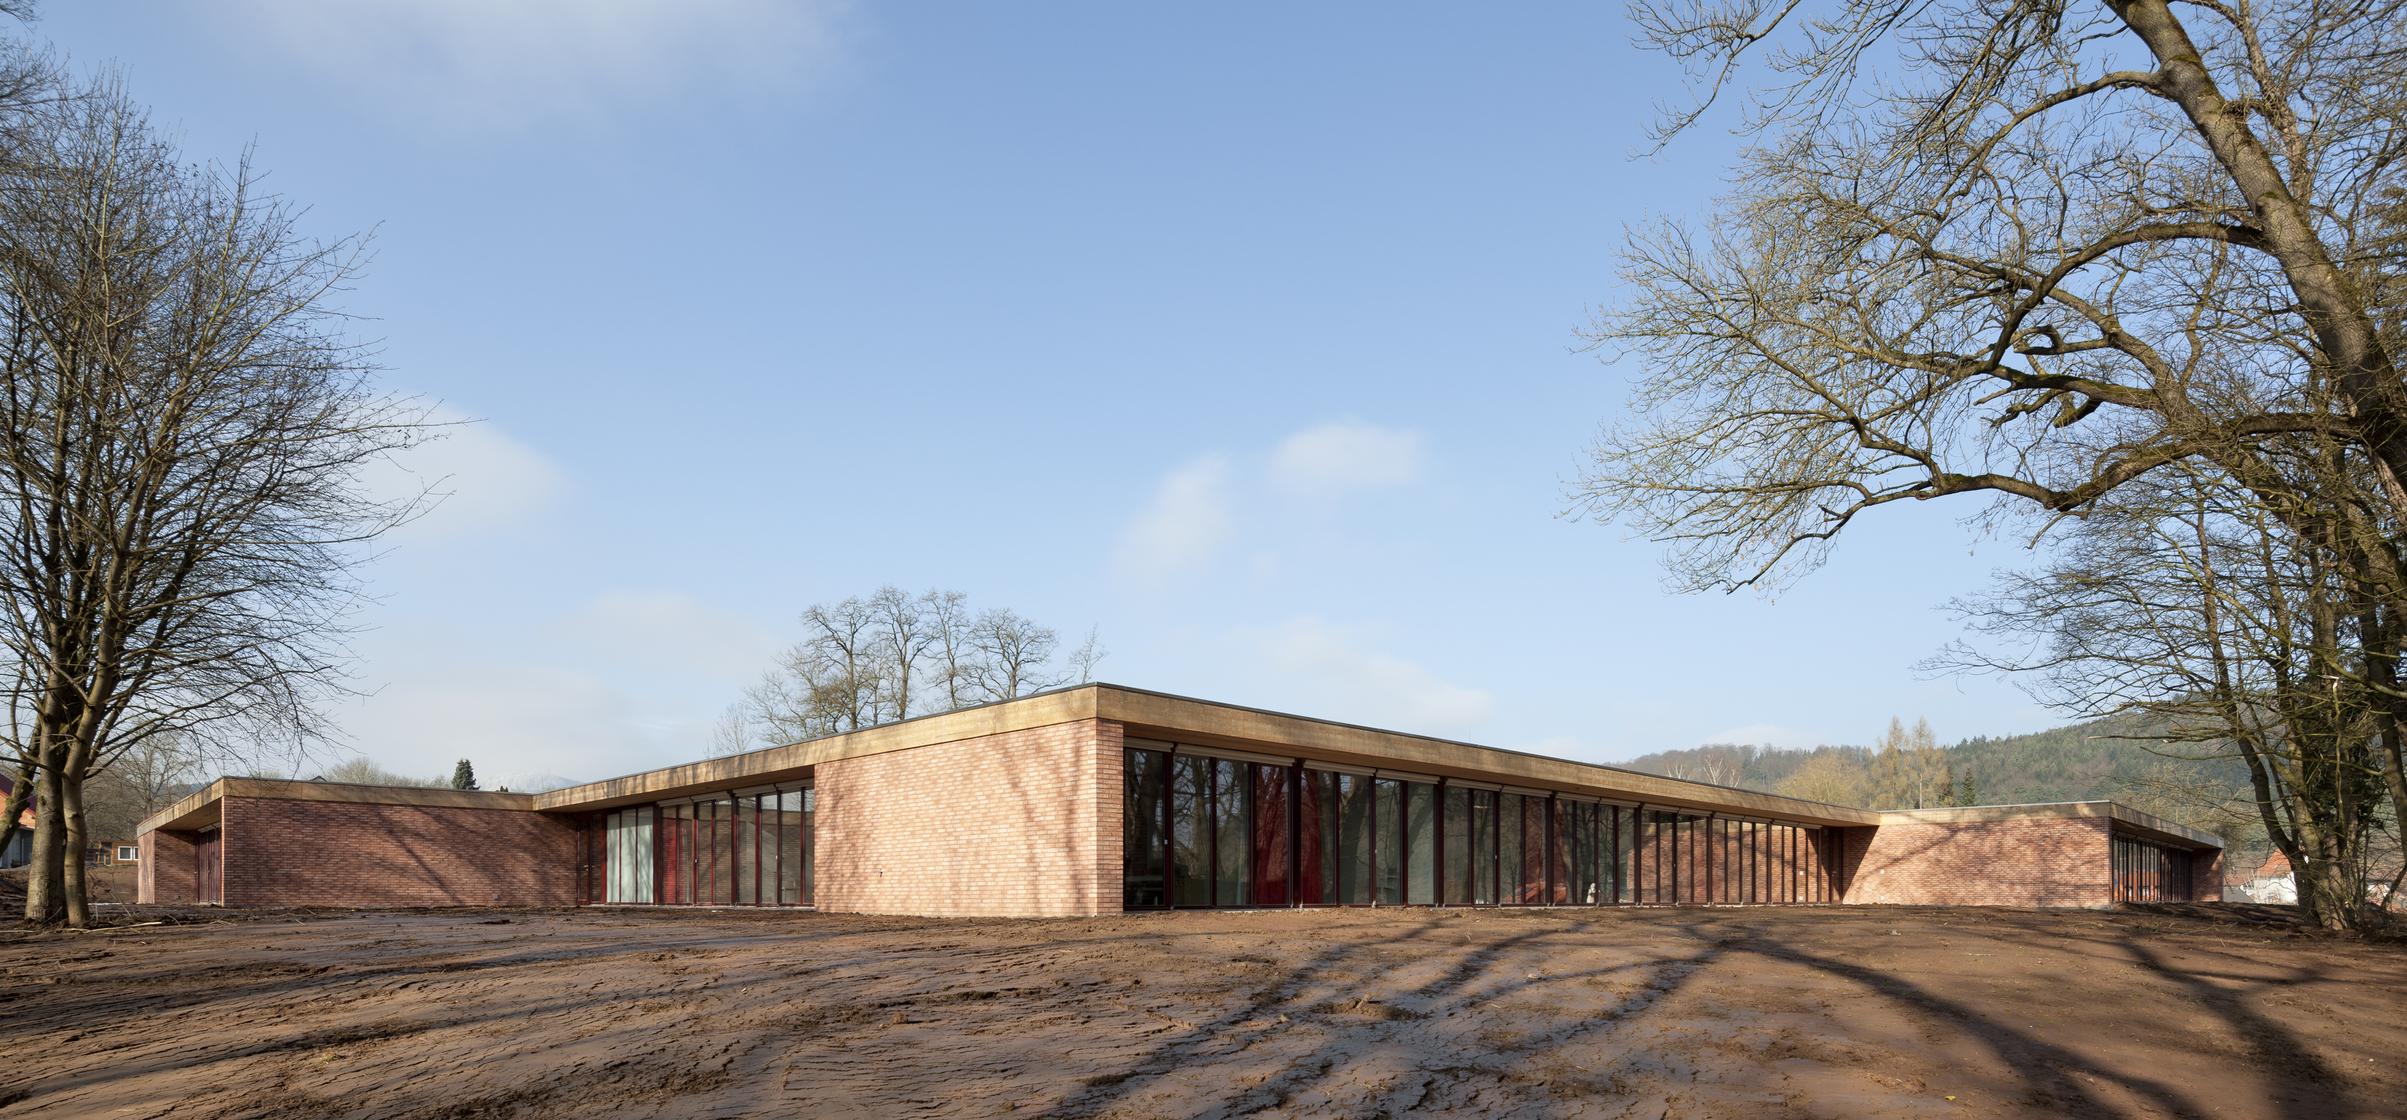 Wohnpflegeheim Haus im Burggarten_Waechter+ Waechter